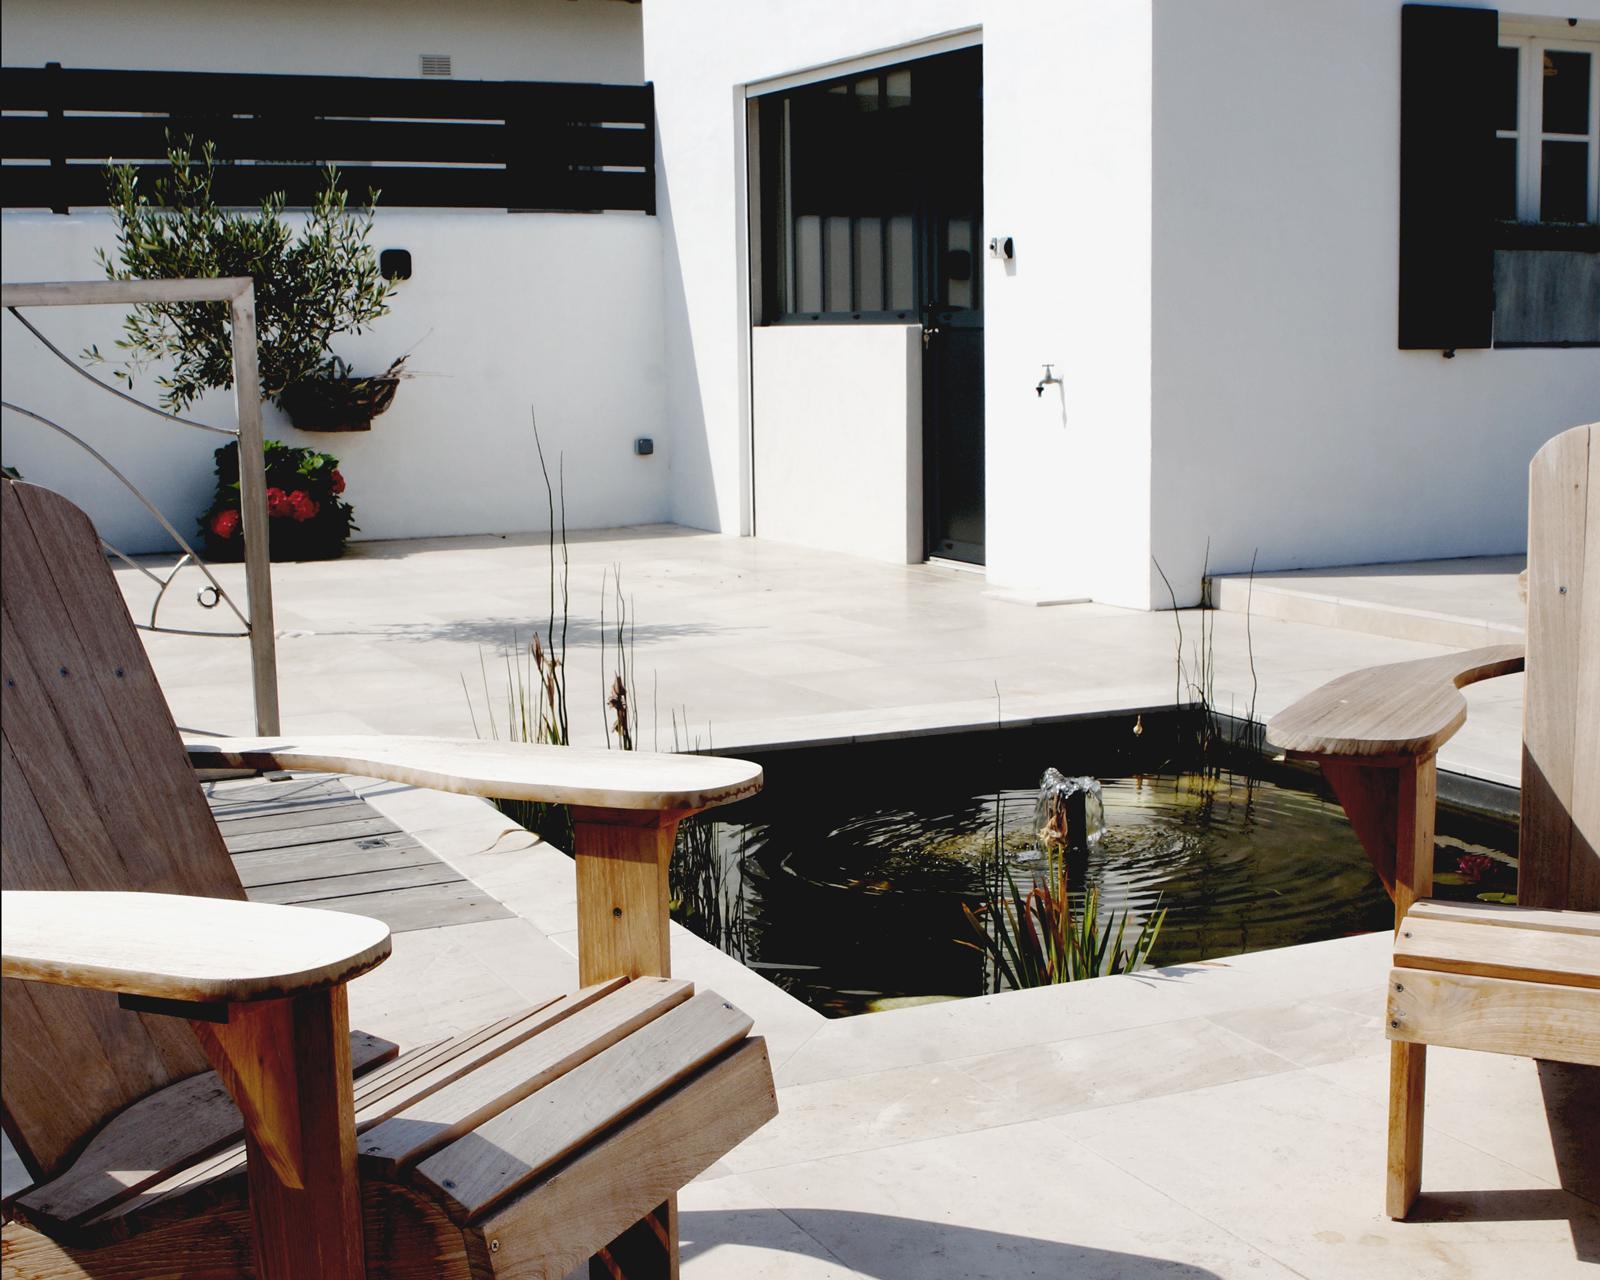 bassin-terrasse-maisondhotes-lesajoncs.jpg